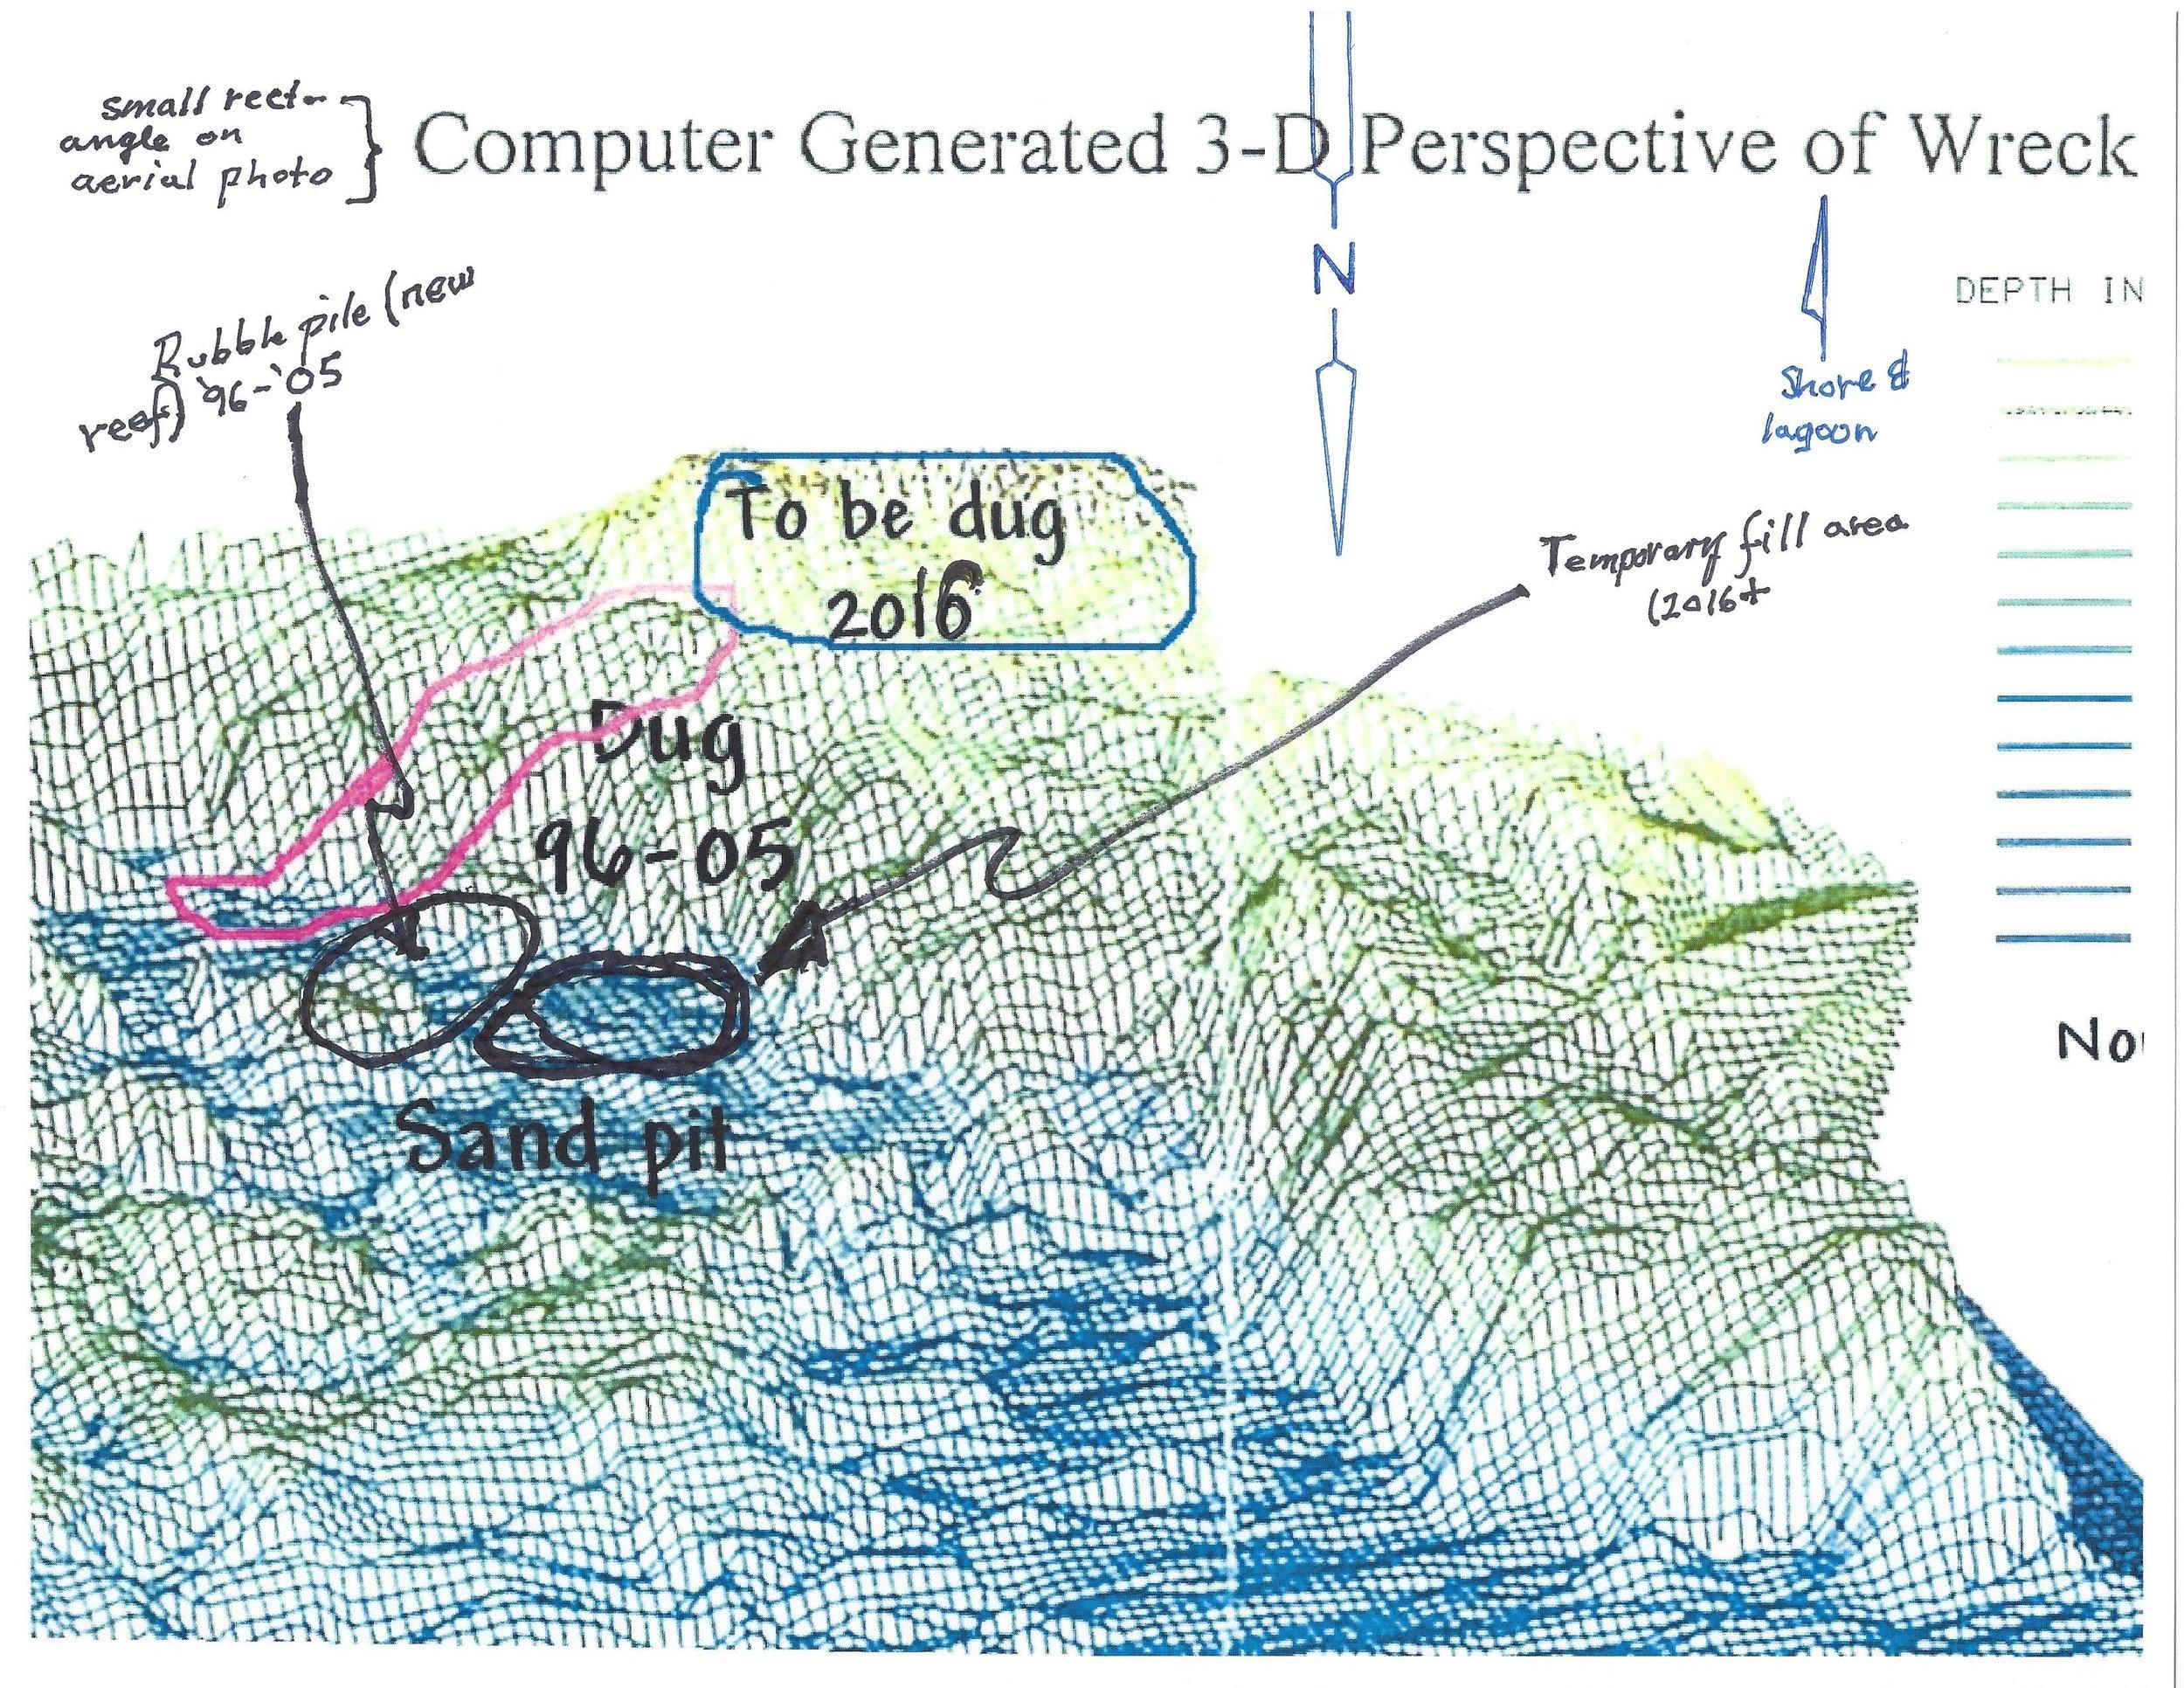 SM SIte 3-D Perspective0003.jpg